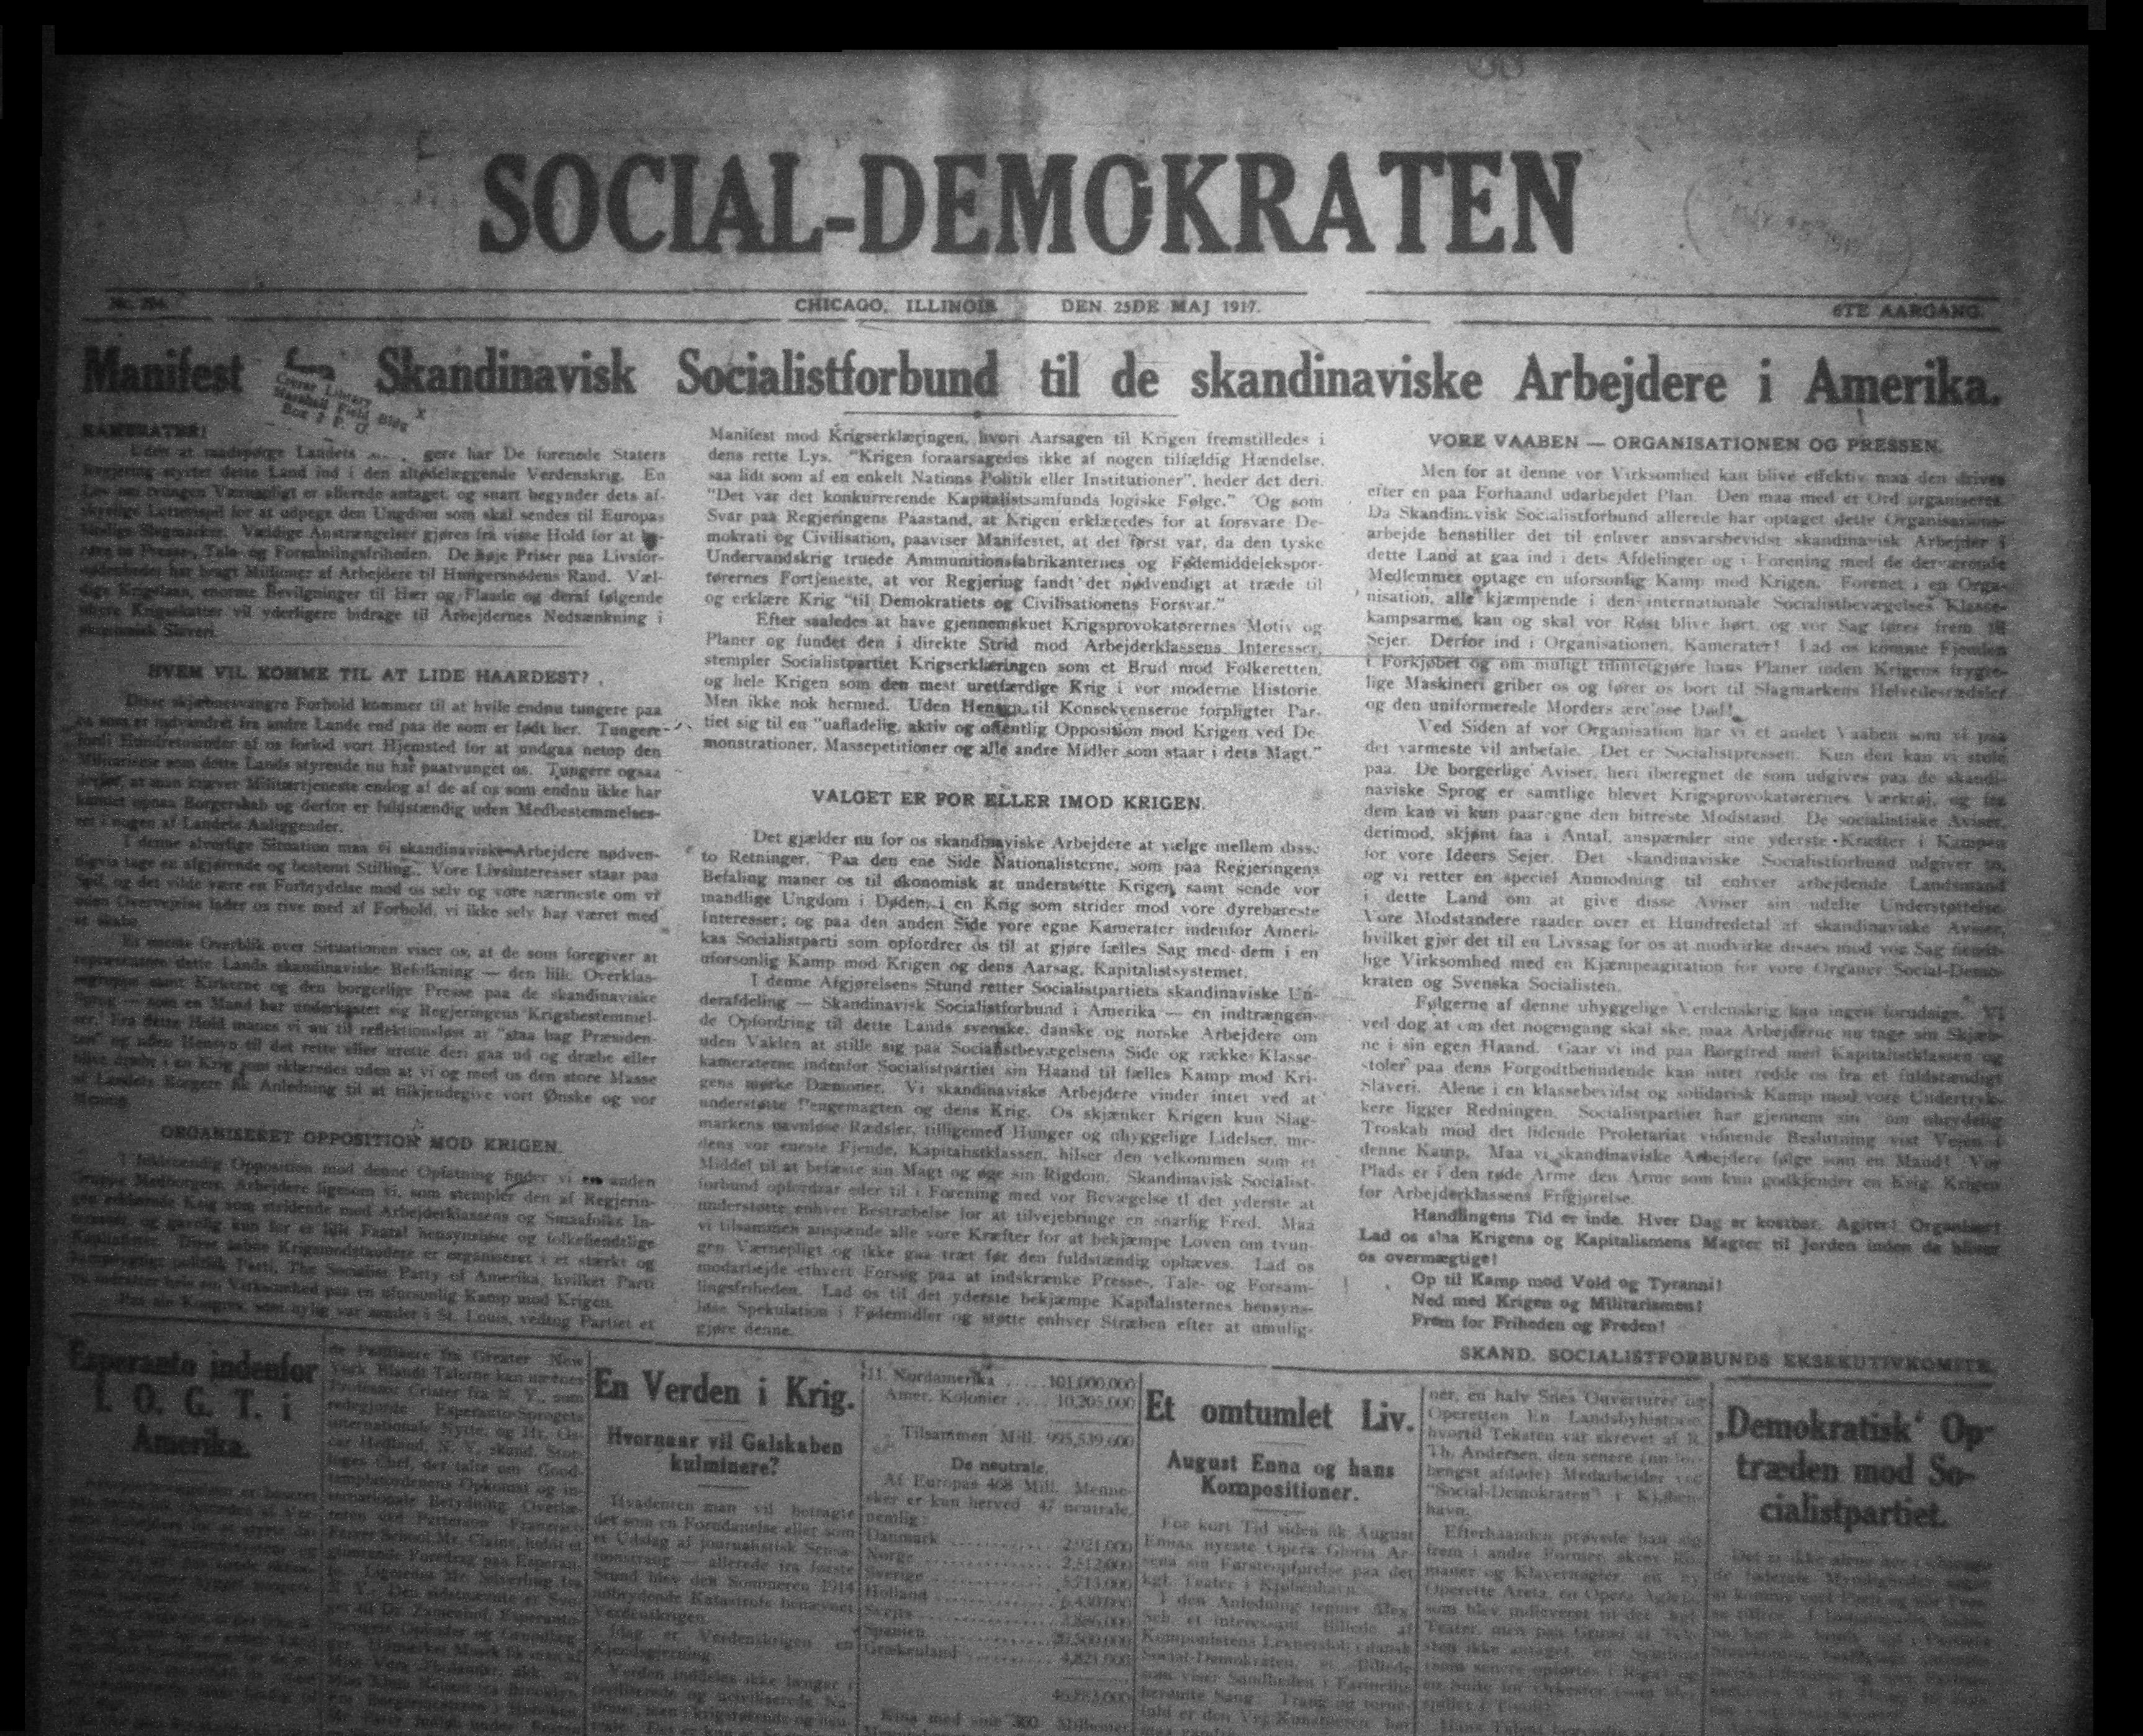 Social-Demokraten (Chicago) - Wikipedia